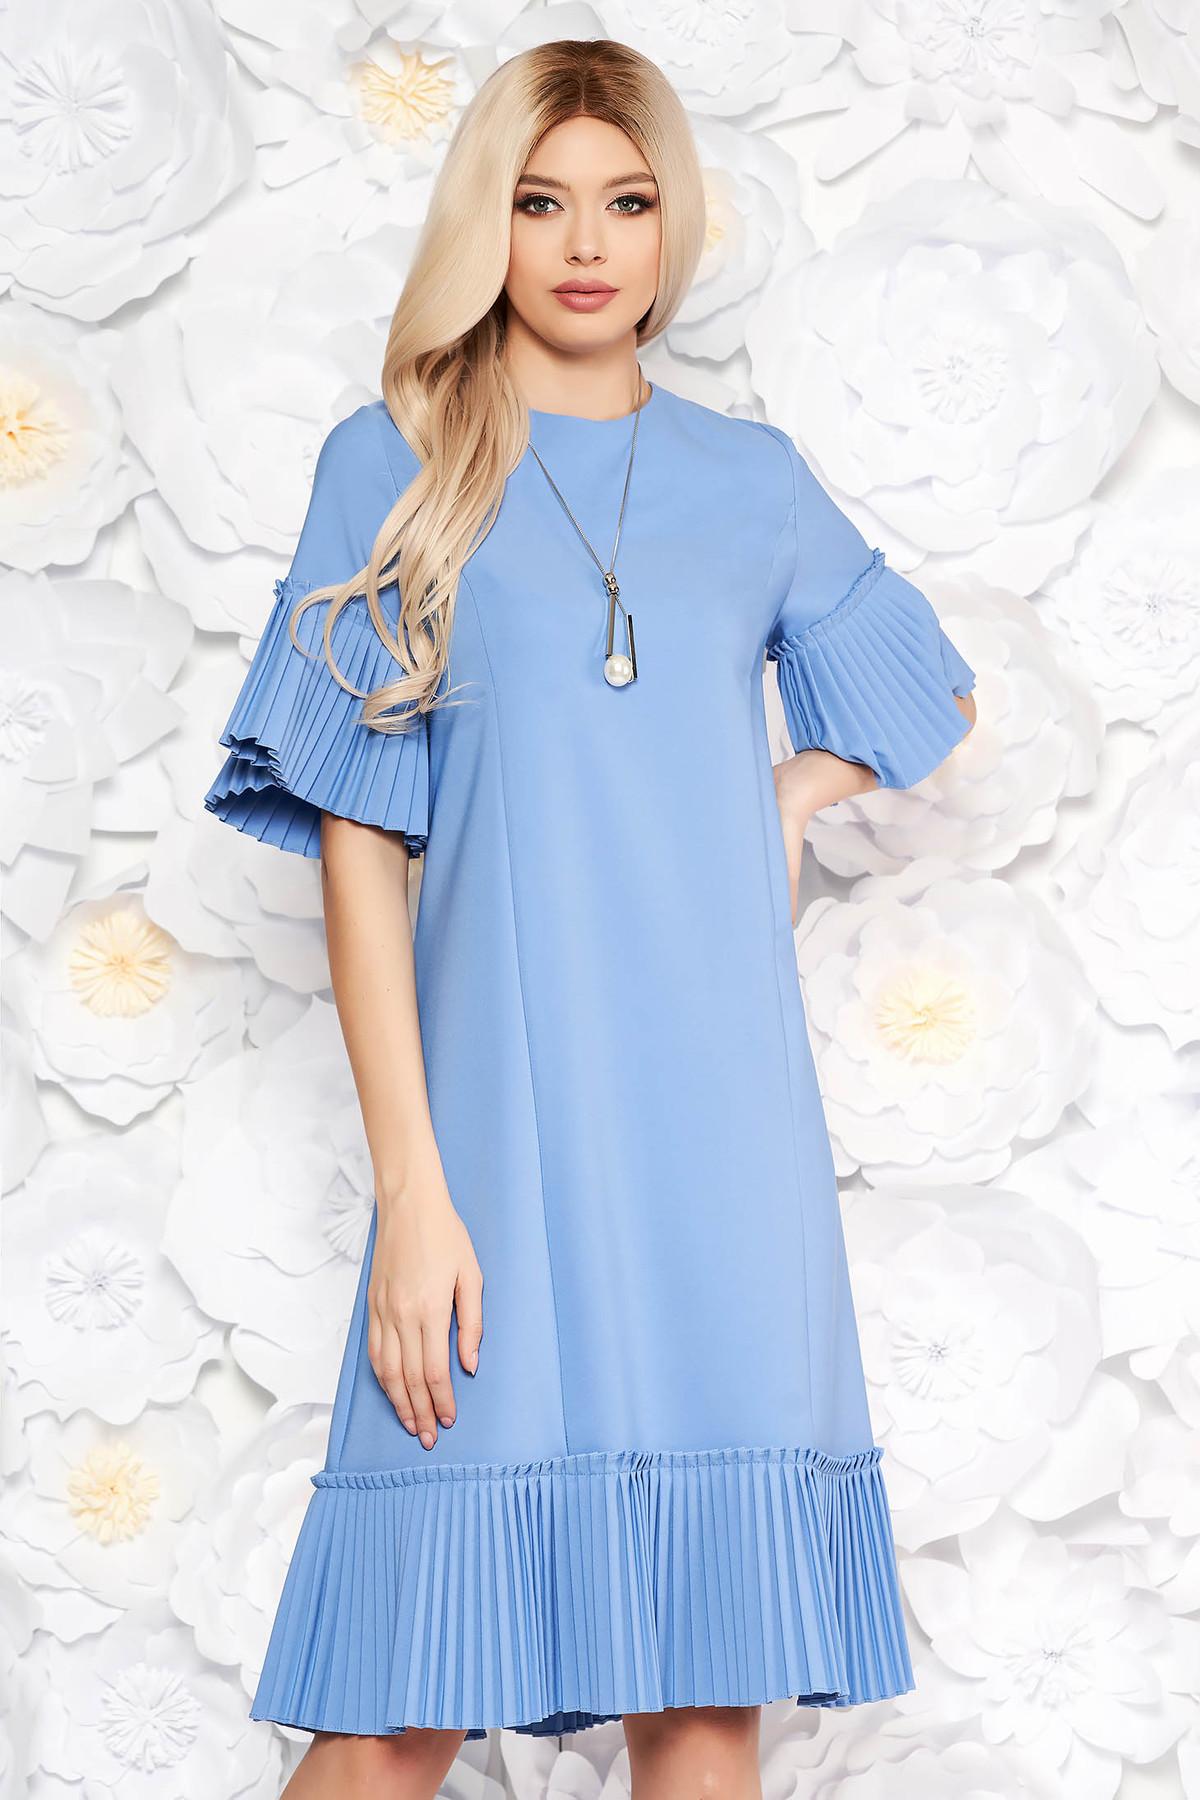 Rochie albastra-deschis eleganta midi cu un croi drept din stofa usor elastica